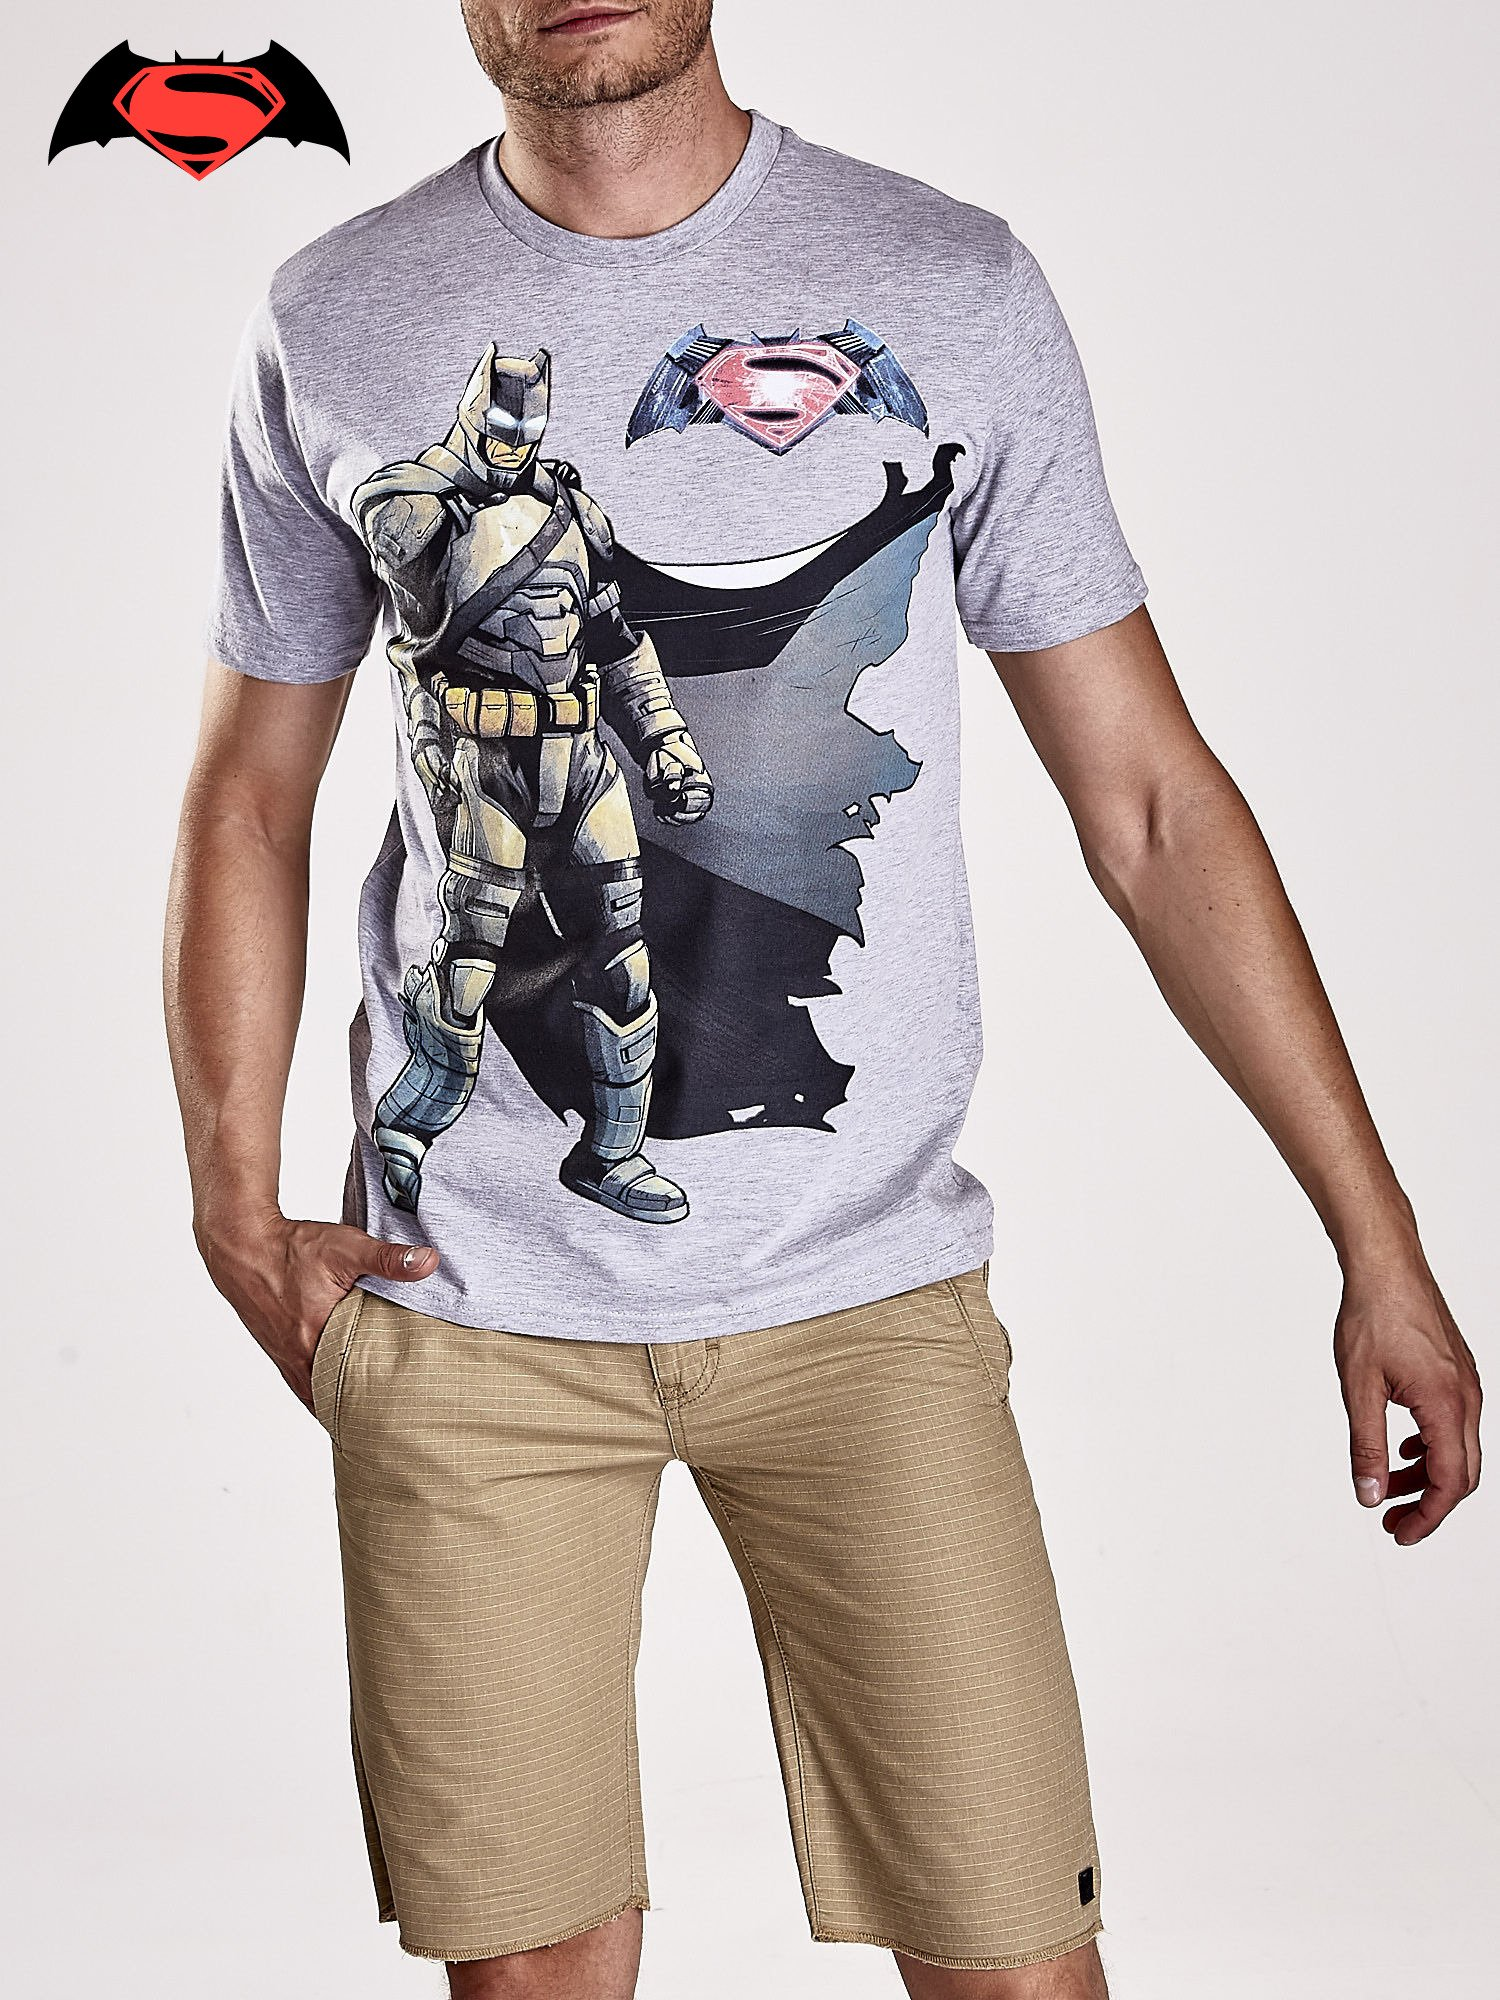 Szary t-shirt męski z nadrukiem BATMAN V SUPERMAN                                  zdj.                                  5